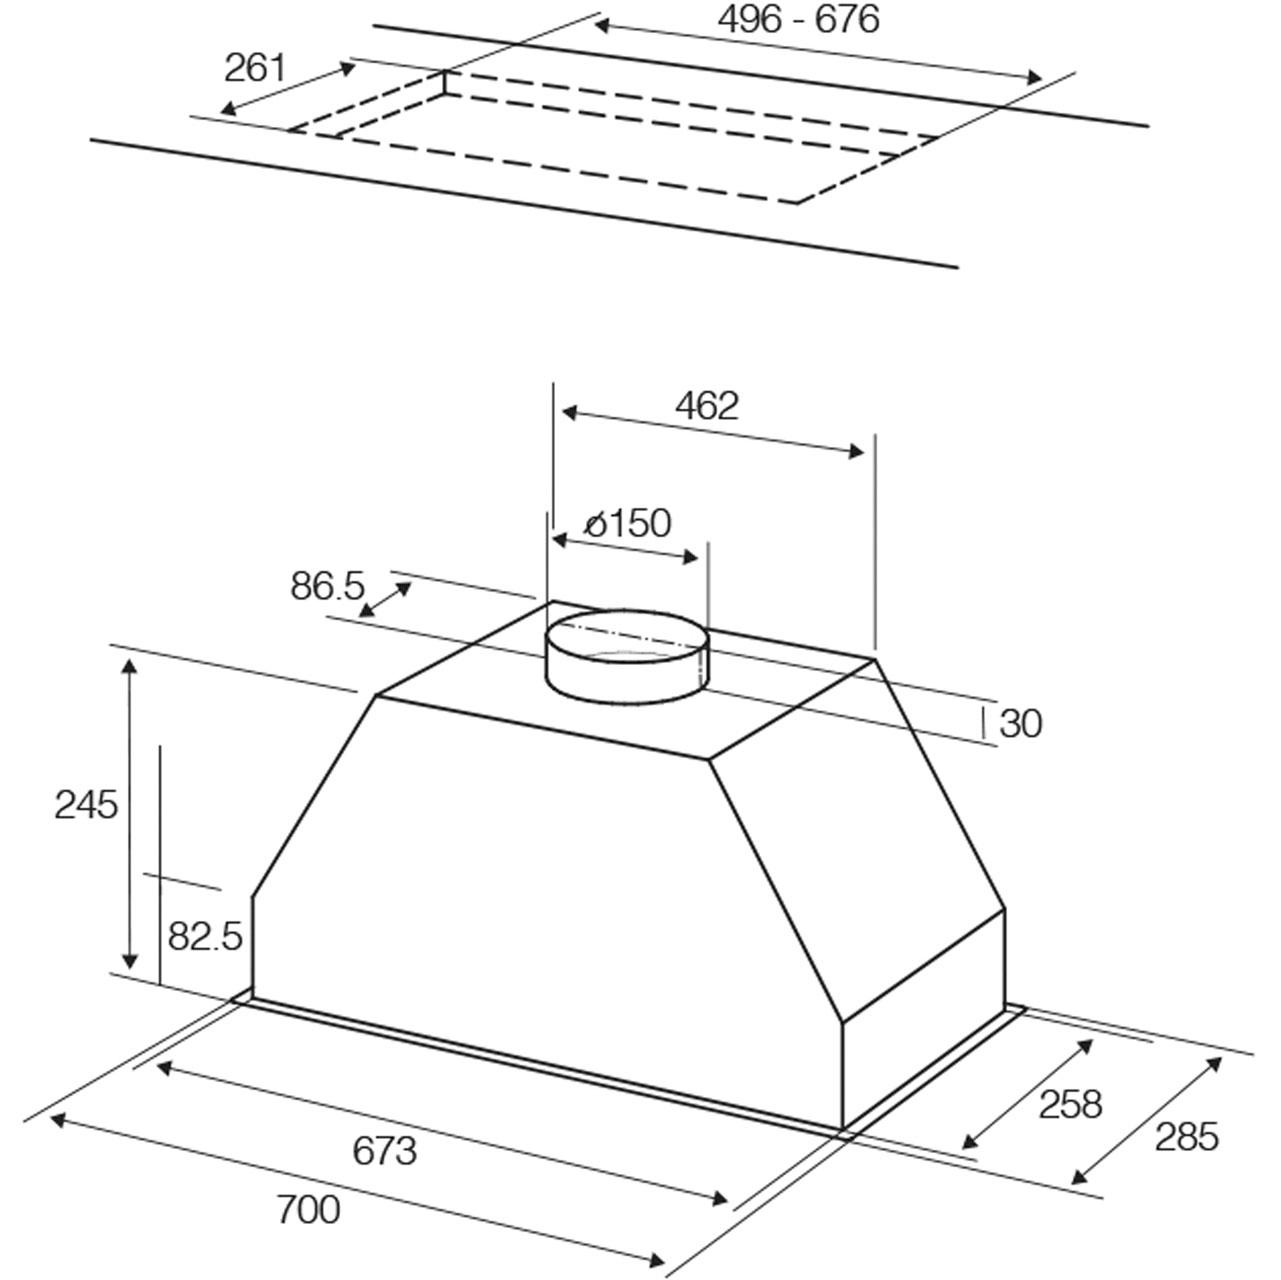 hood p780 70a_ss_britannia_hood_dim_l britannia canopy cooker hood hood p780 70a ao com britannia range cooker wiring diagram at reclaimingppi.co